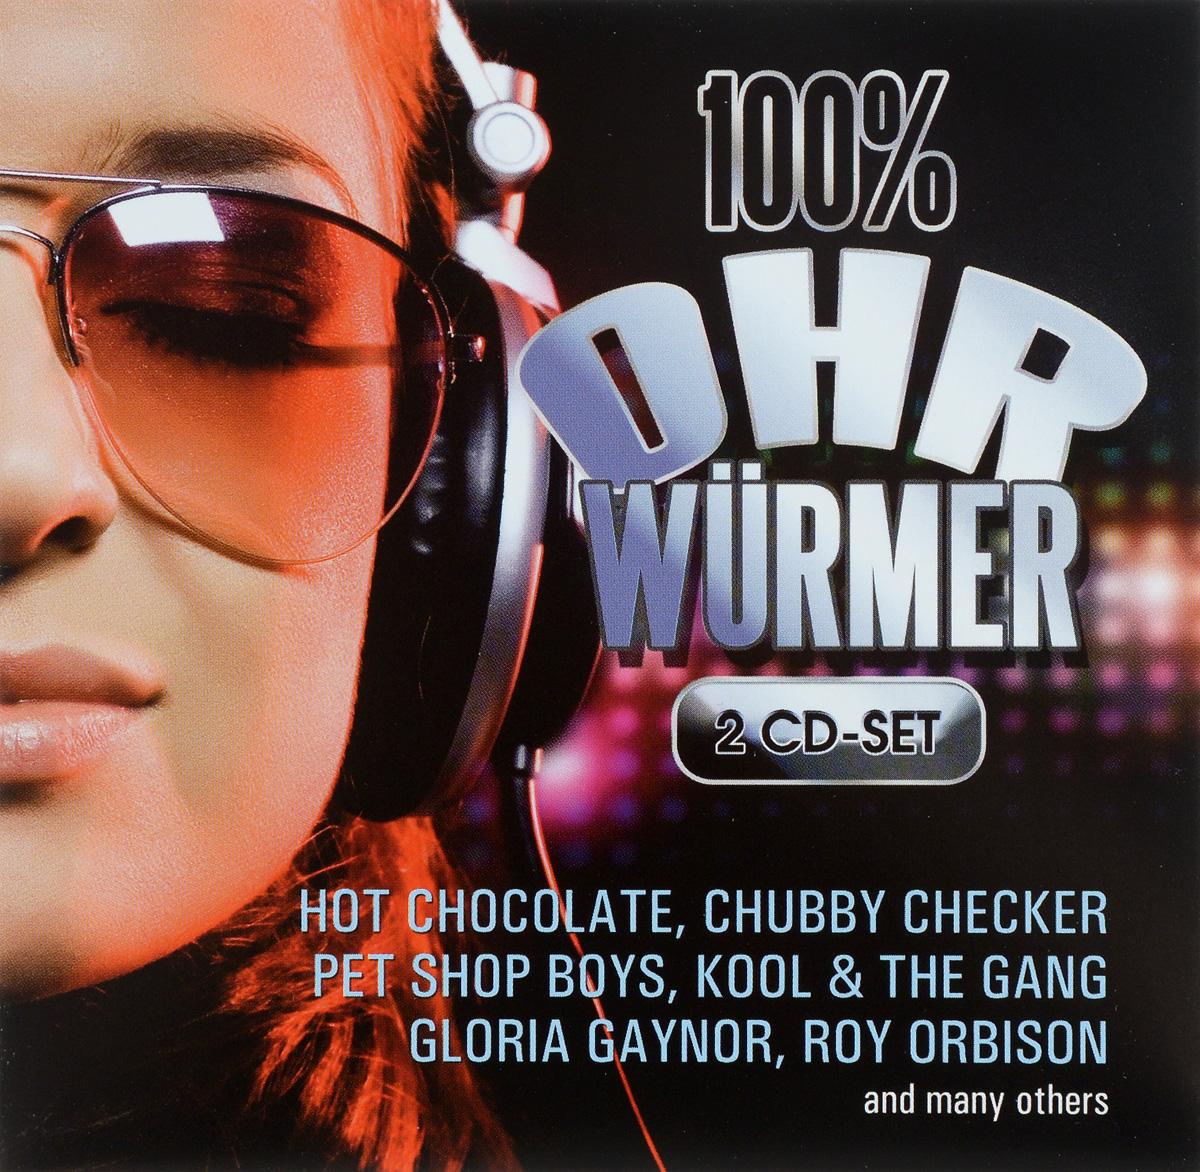 100% Ohrwurmer (2 CD)